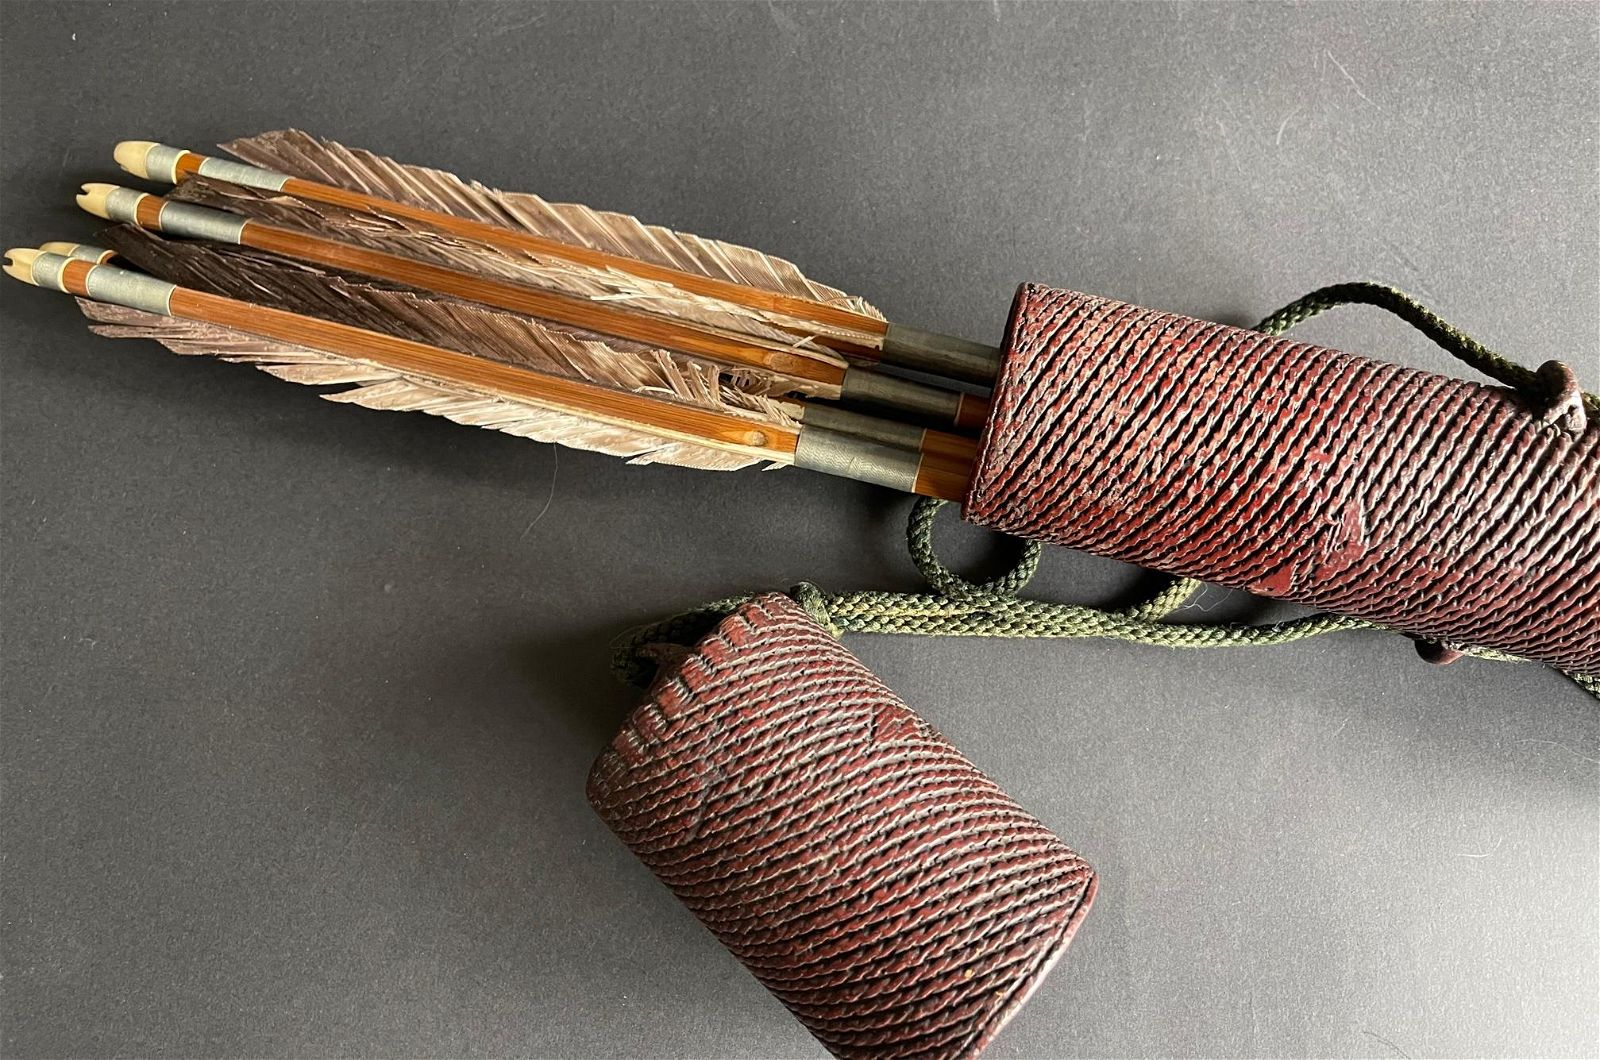 Japanese Samurai quiver with arrows End of Edo period.